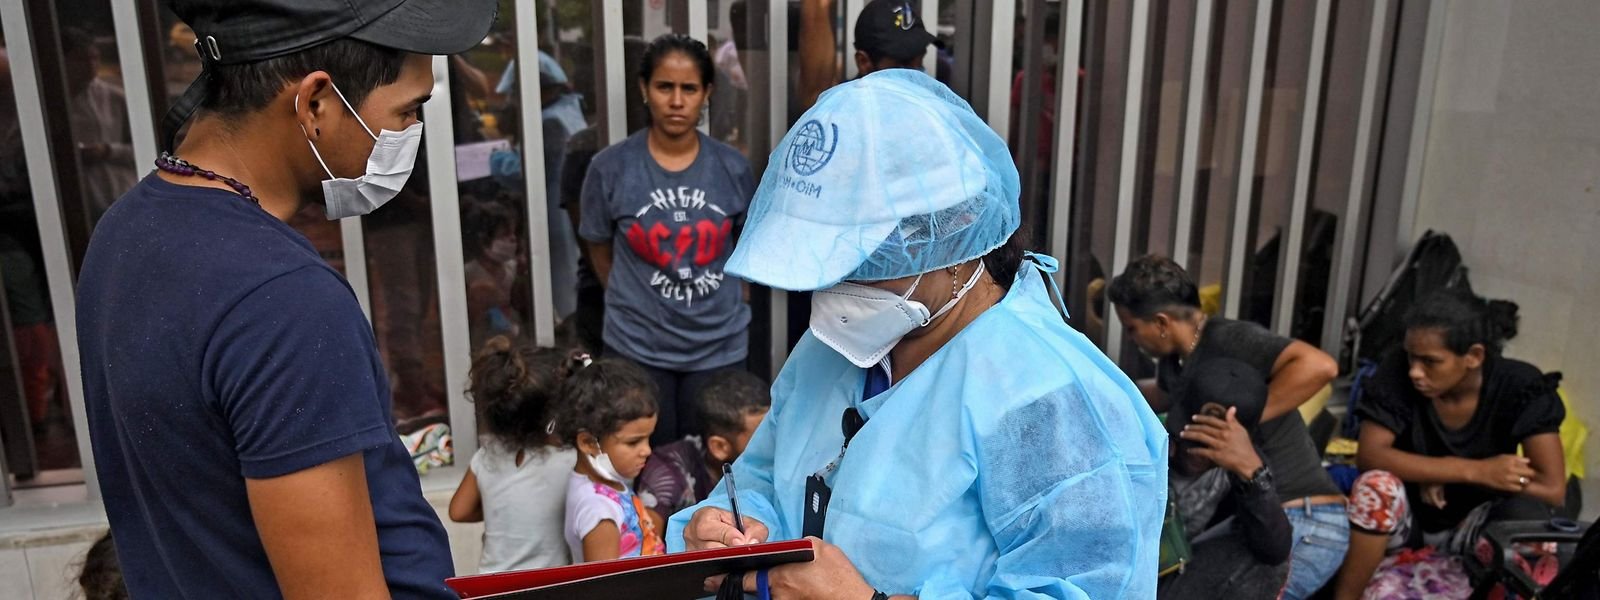 Venezolanische Migranten in Kolumbien lassen sich auf das Corona-Virus testen.